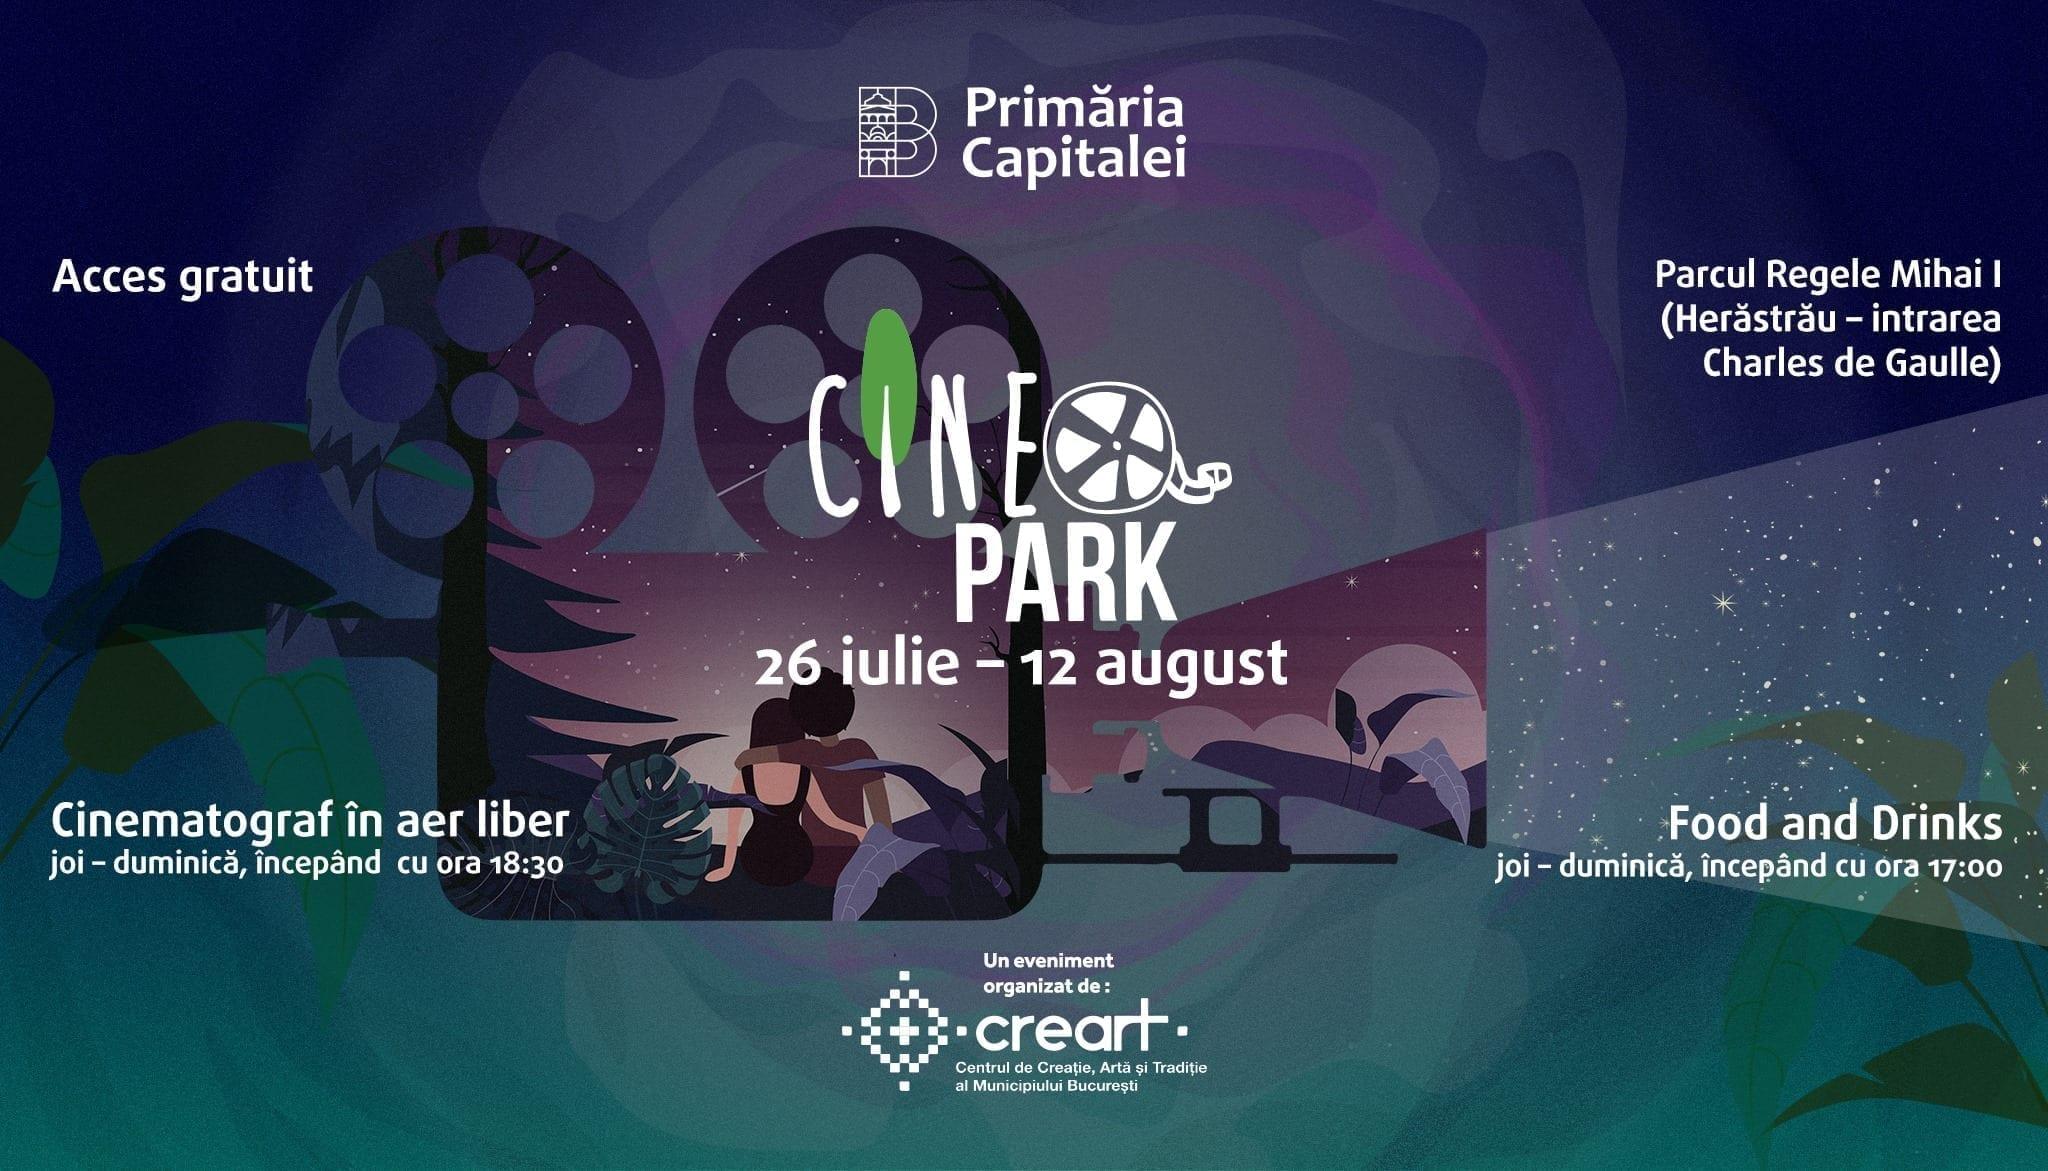 CineParK - cinematograf în aer liber